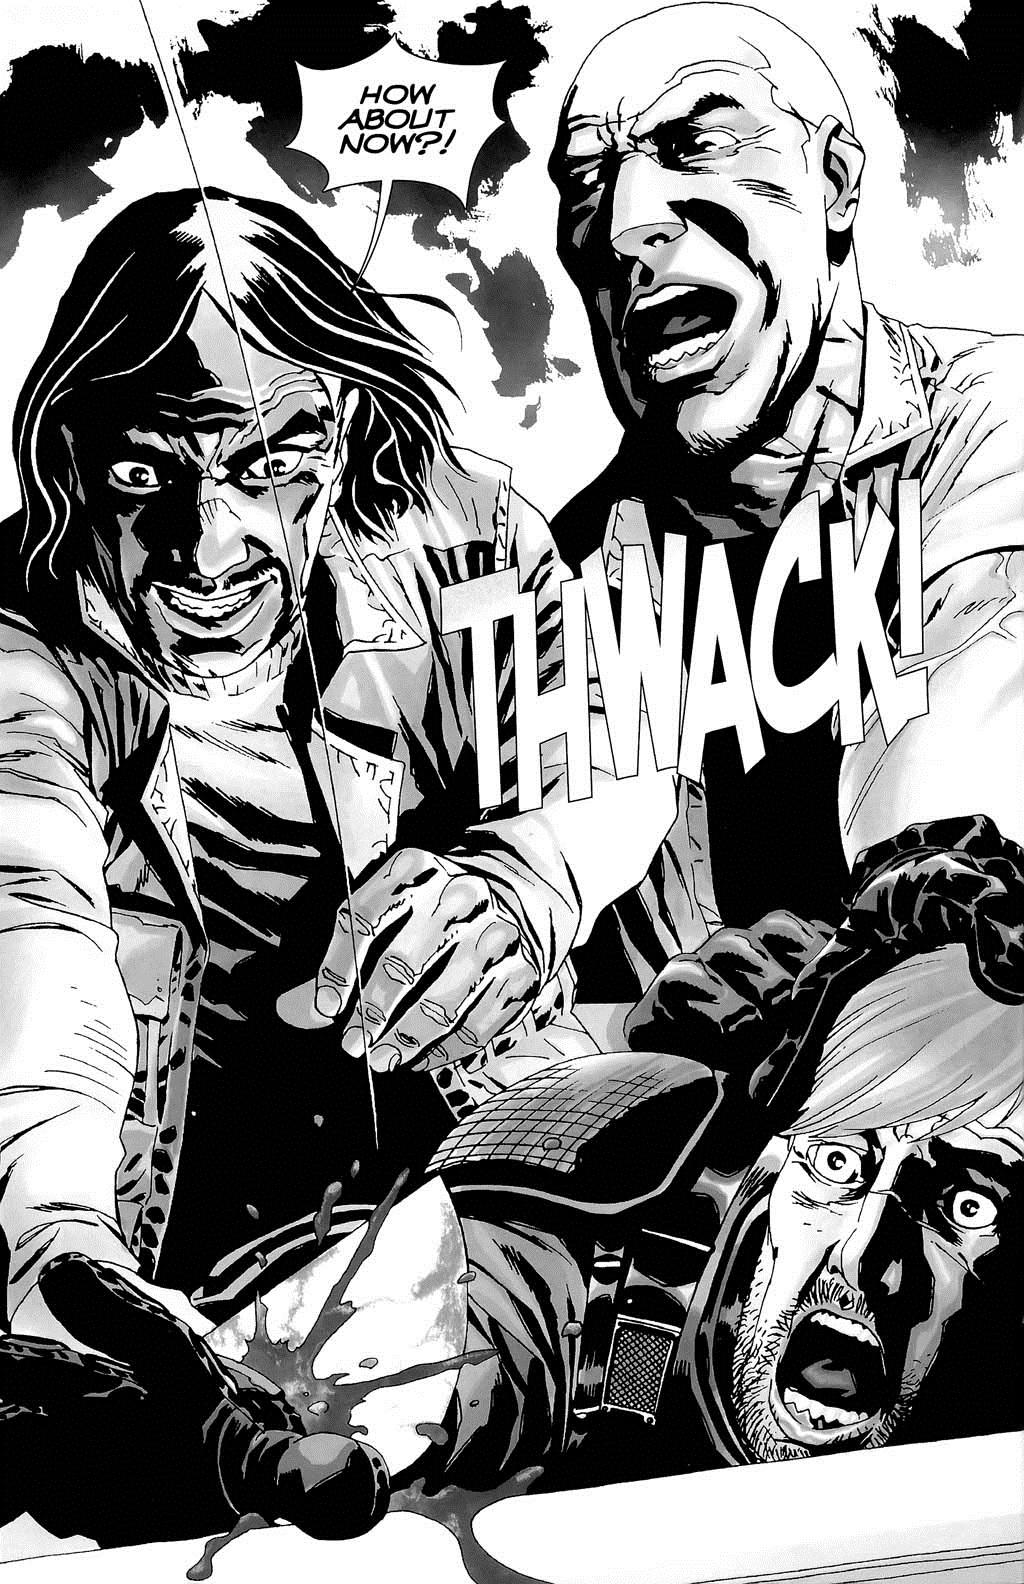 Walking Dead Governor Loses His Eye